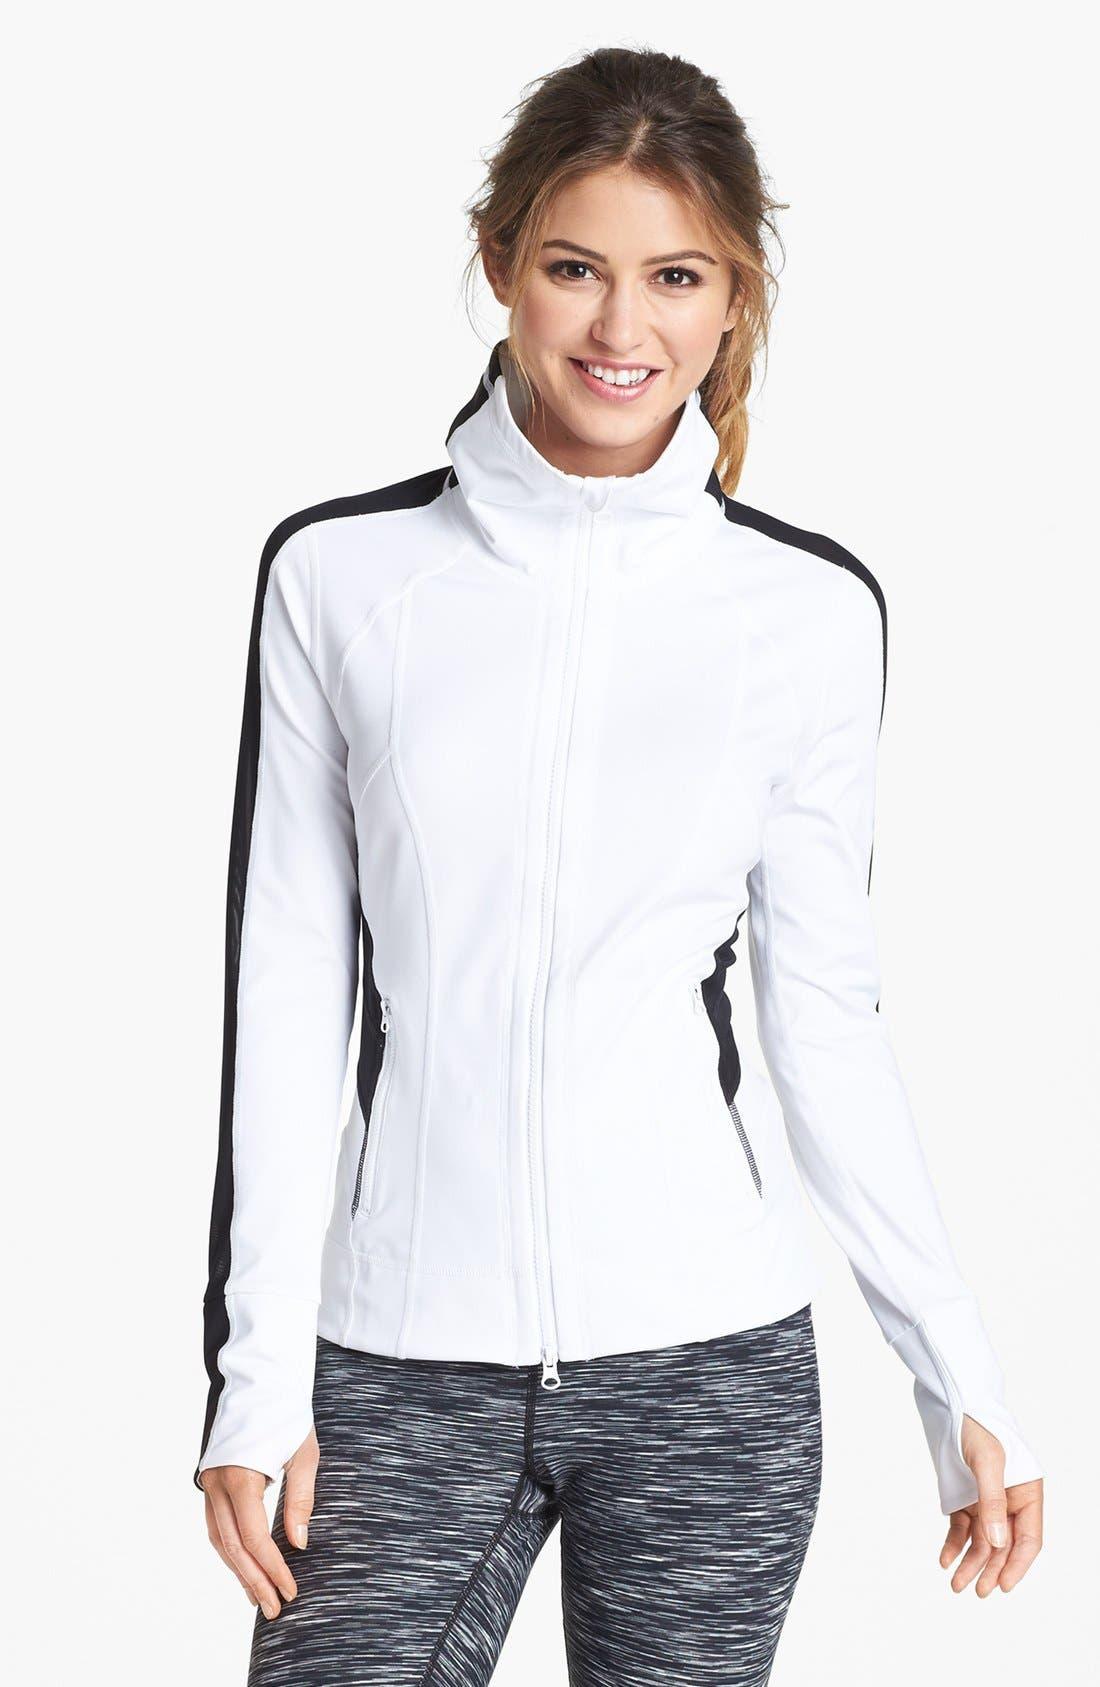 Main Image - Zella 'Bliss' Colorblock Jacket